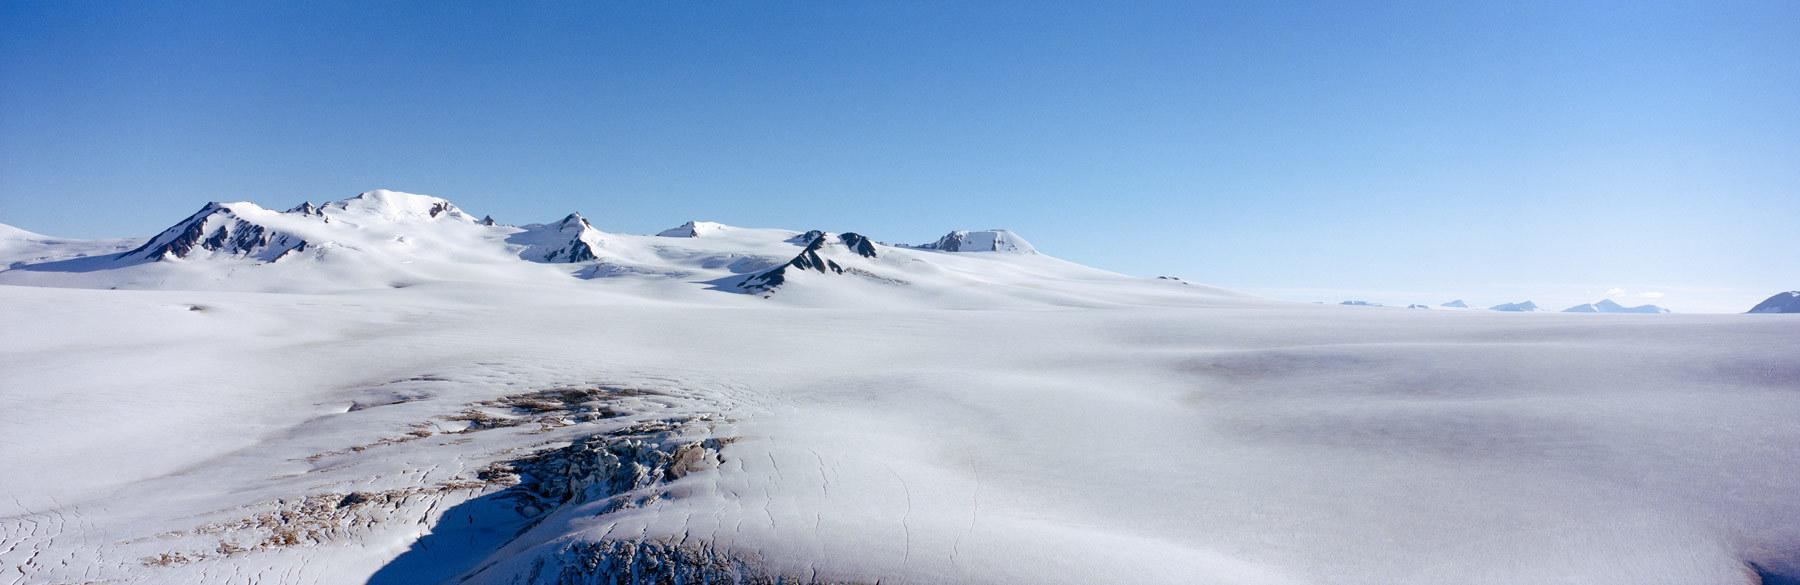 Lightbox_jorstad_kenai_fjords_unkcdt